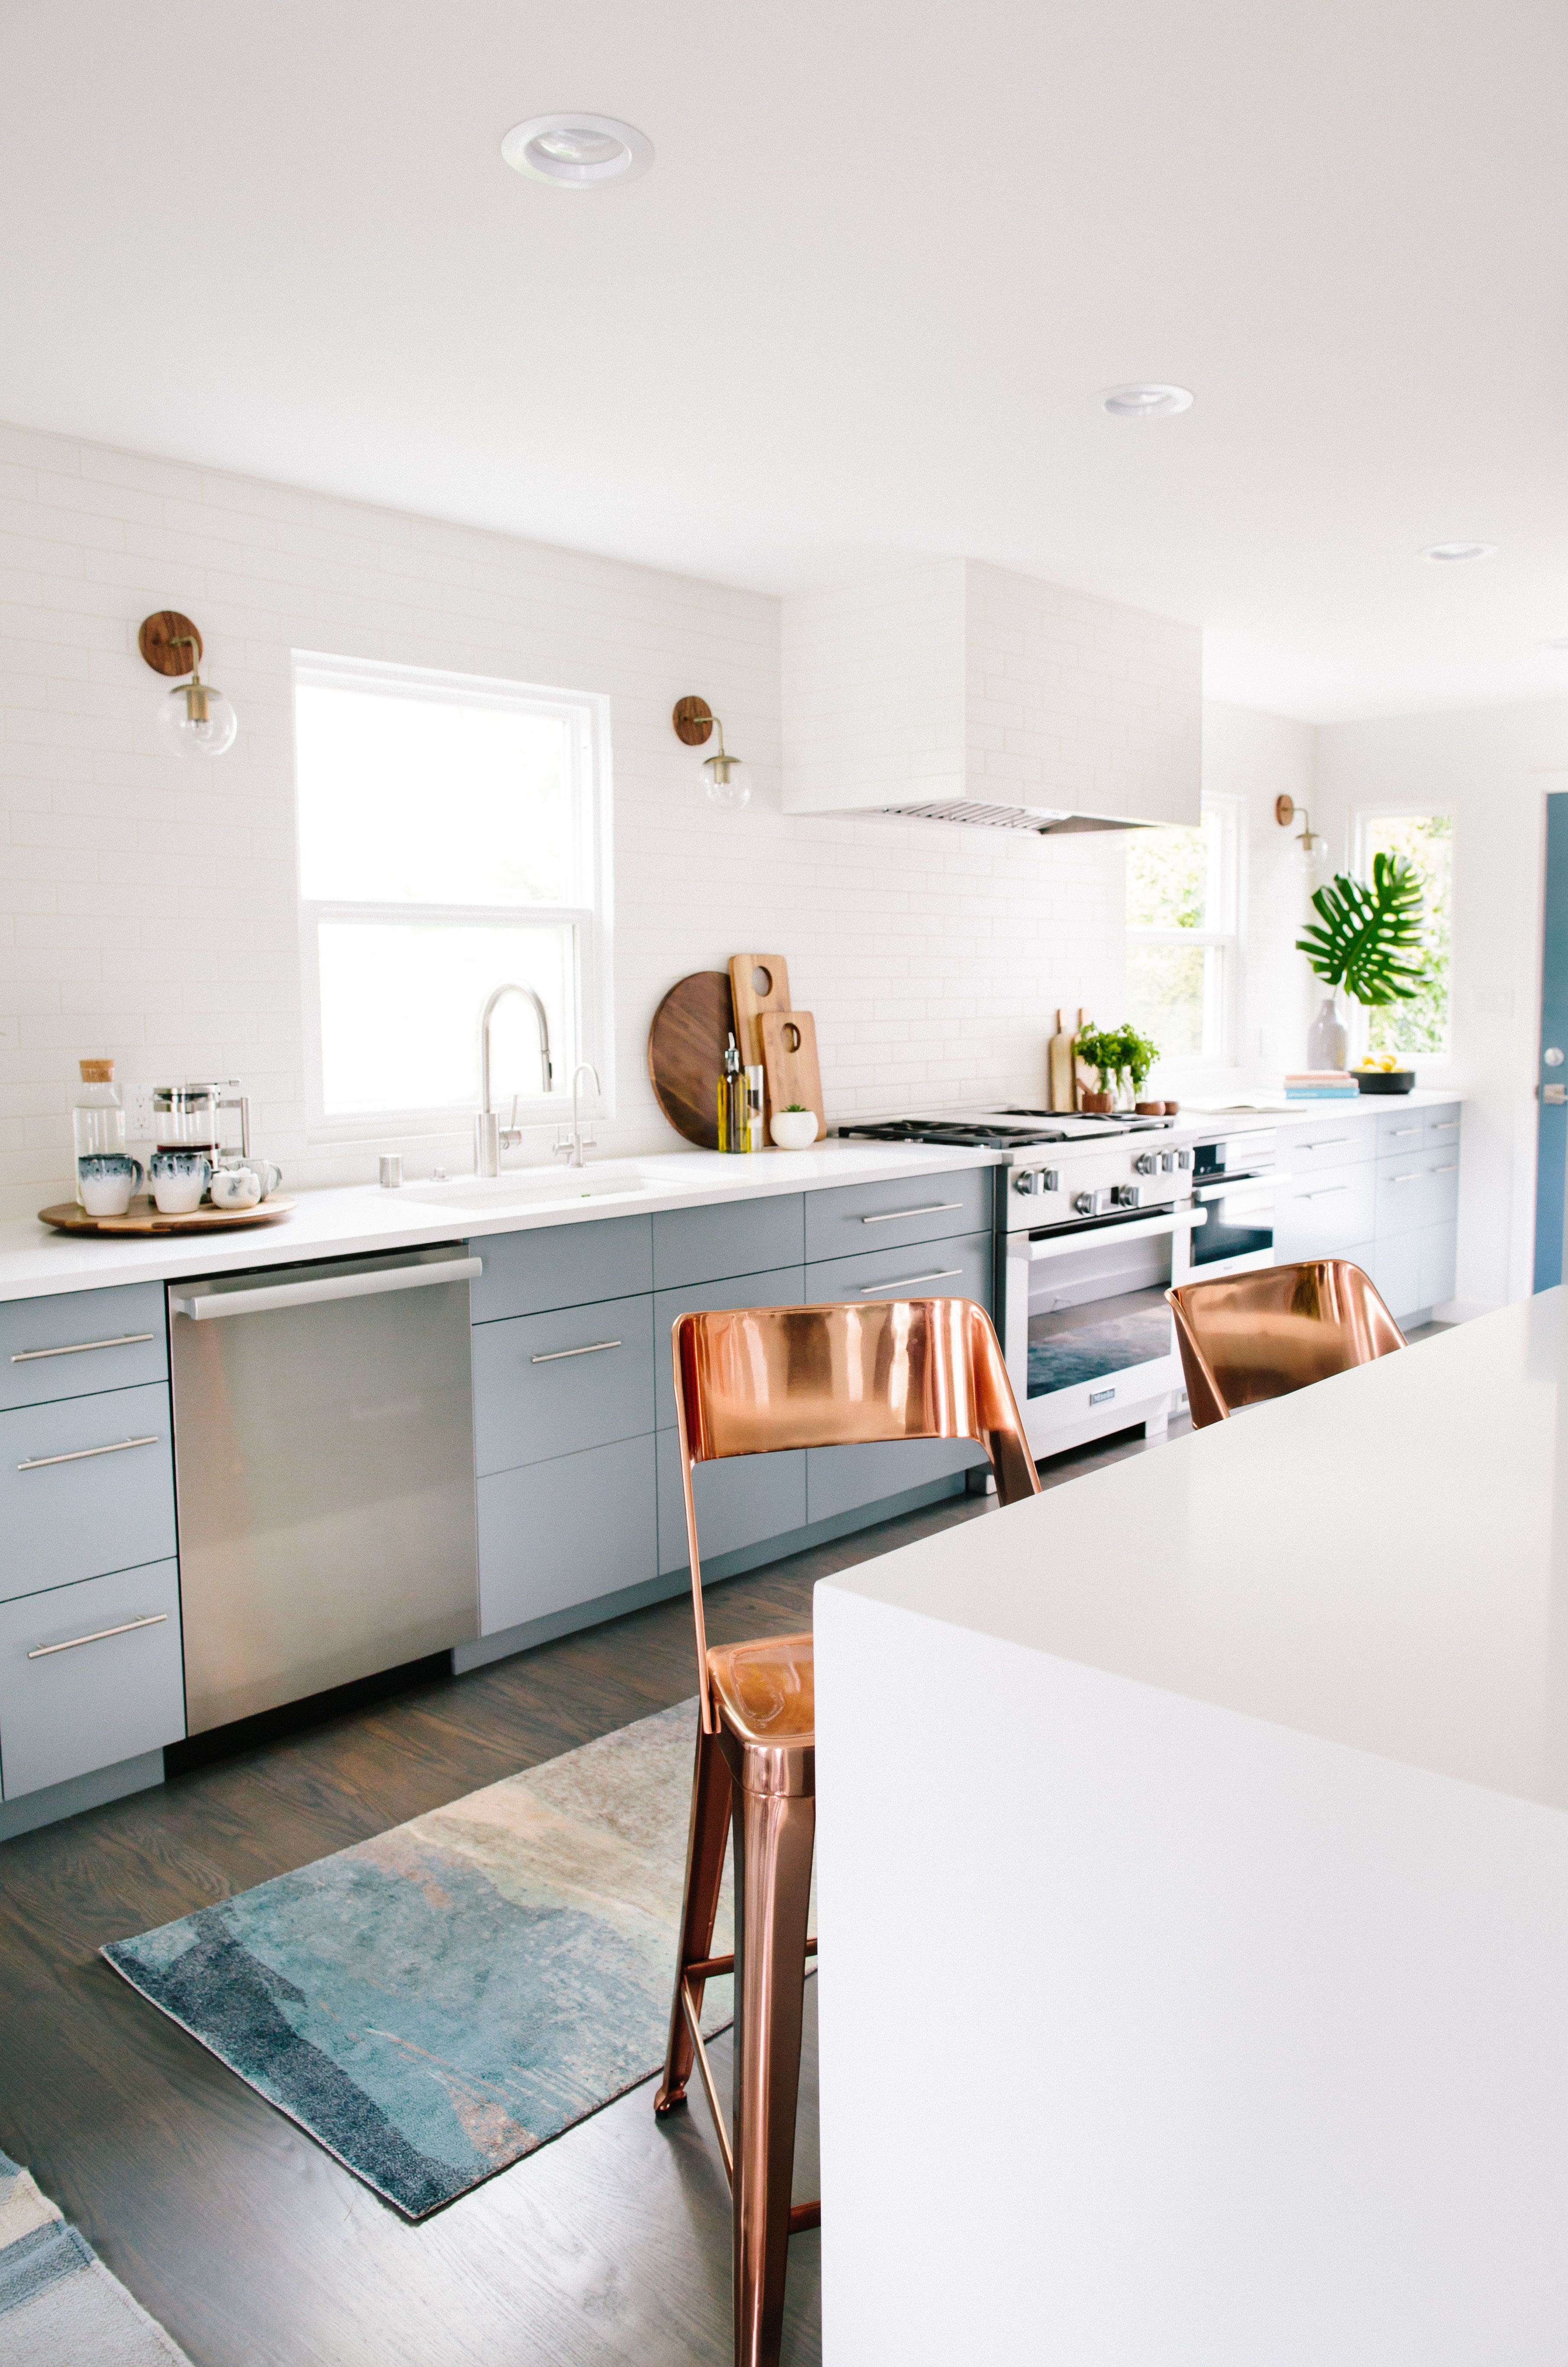 Kitchen Remodel Ideas for an Open Floor Plan   Kitchen ...